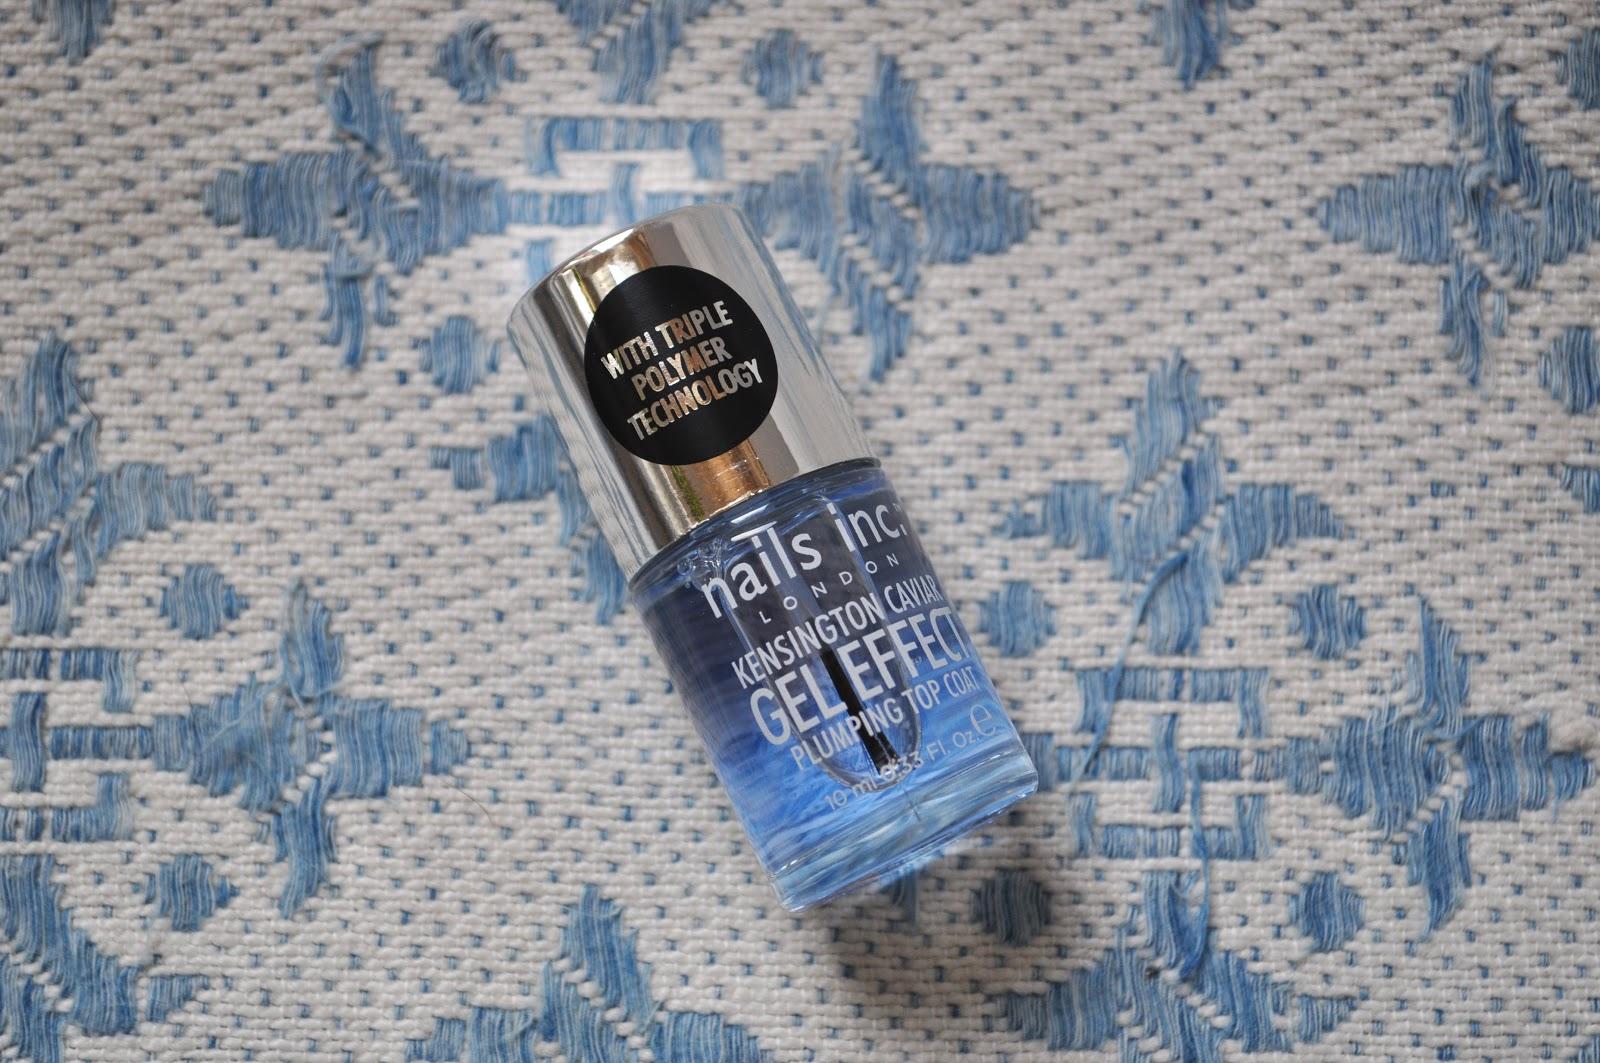 Nail Of The Day Nails Inc Kensington Caviar Gel Effect